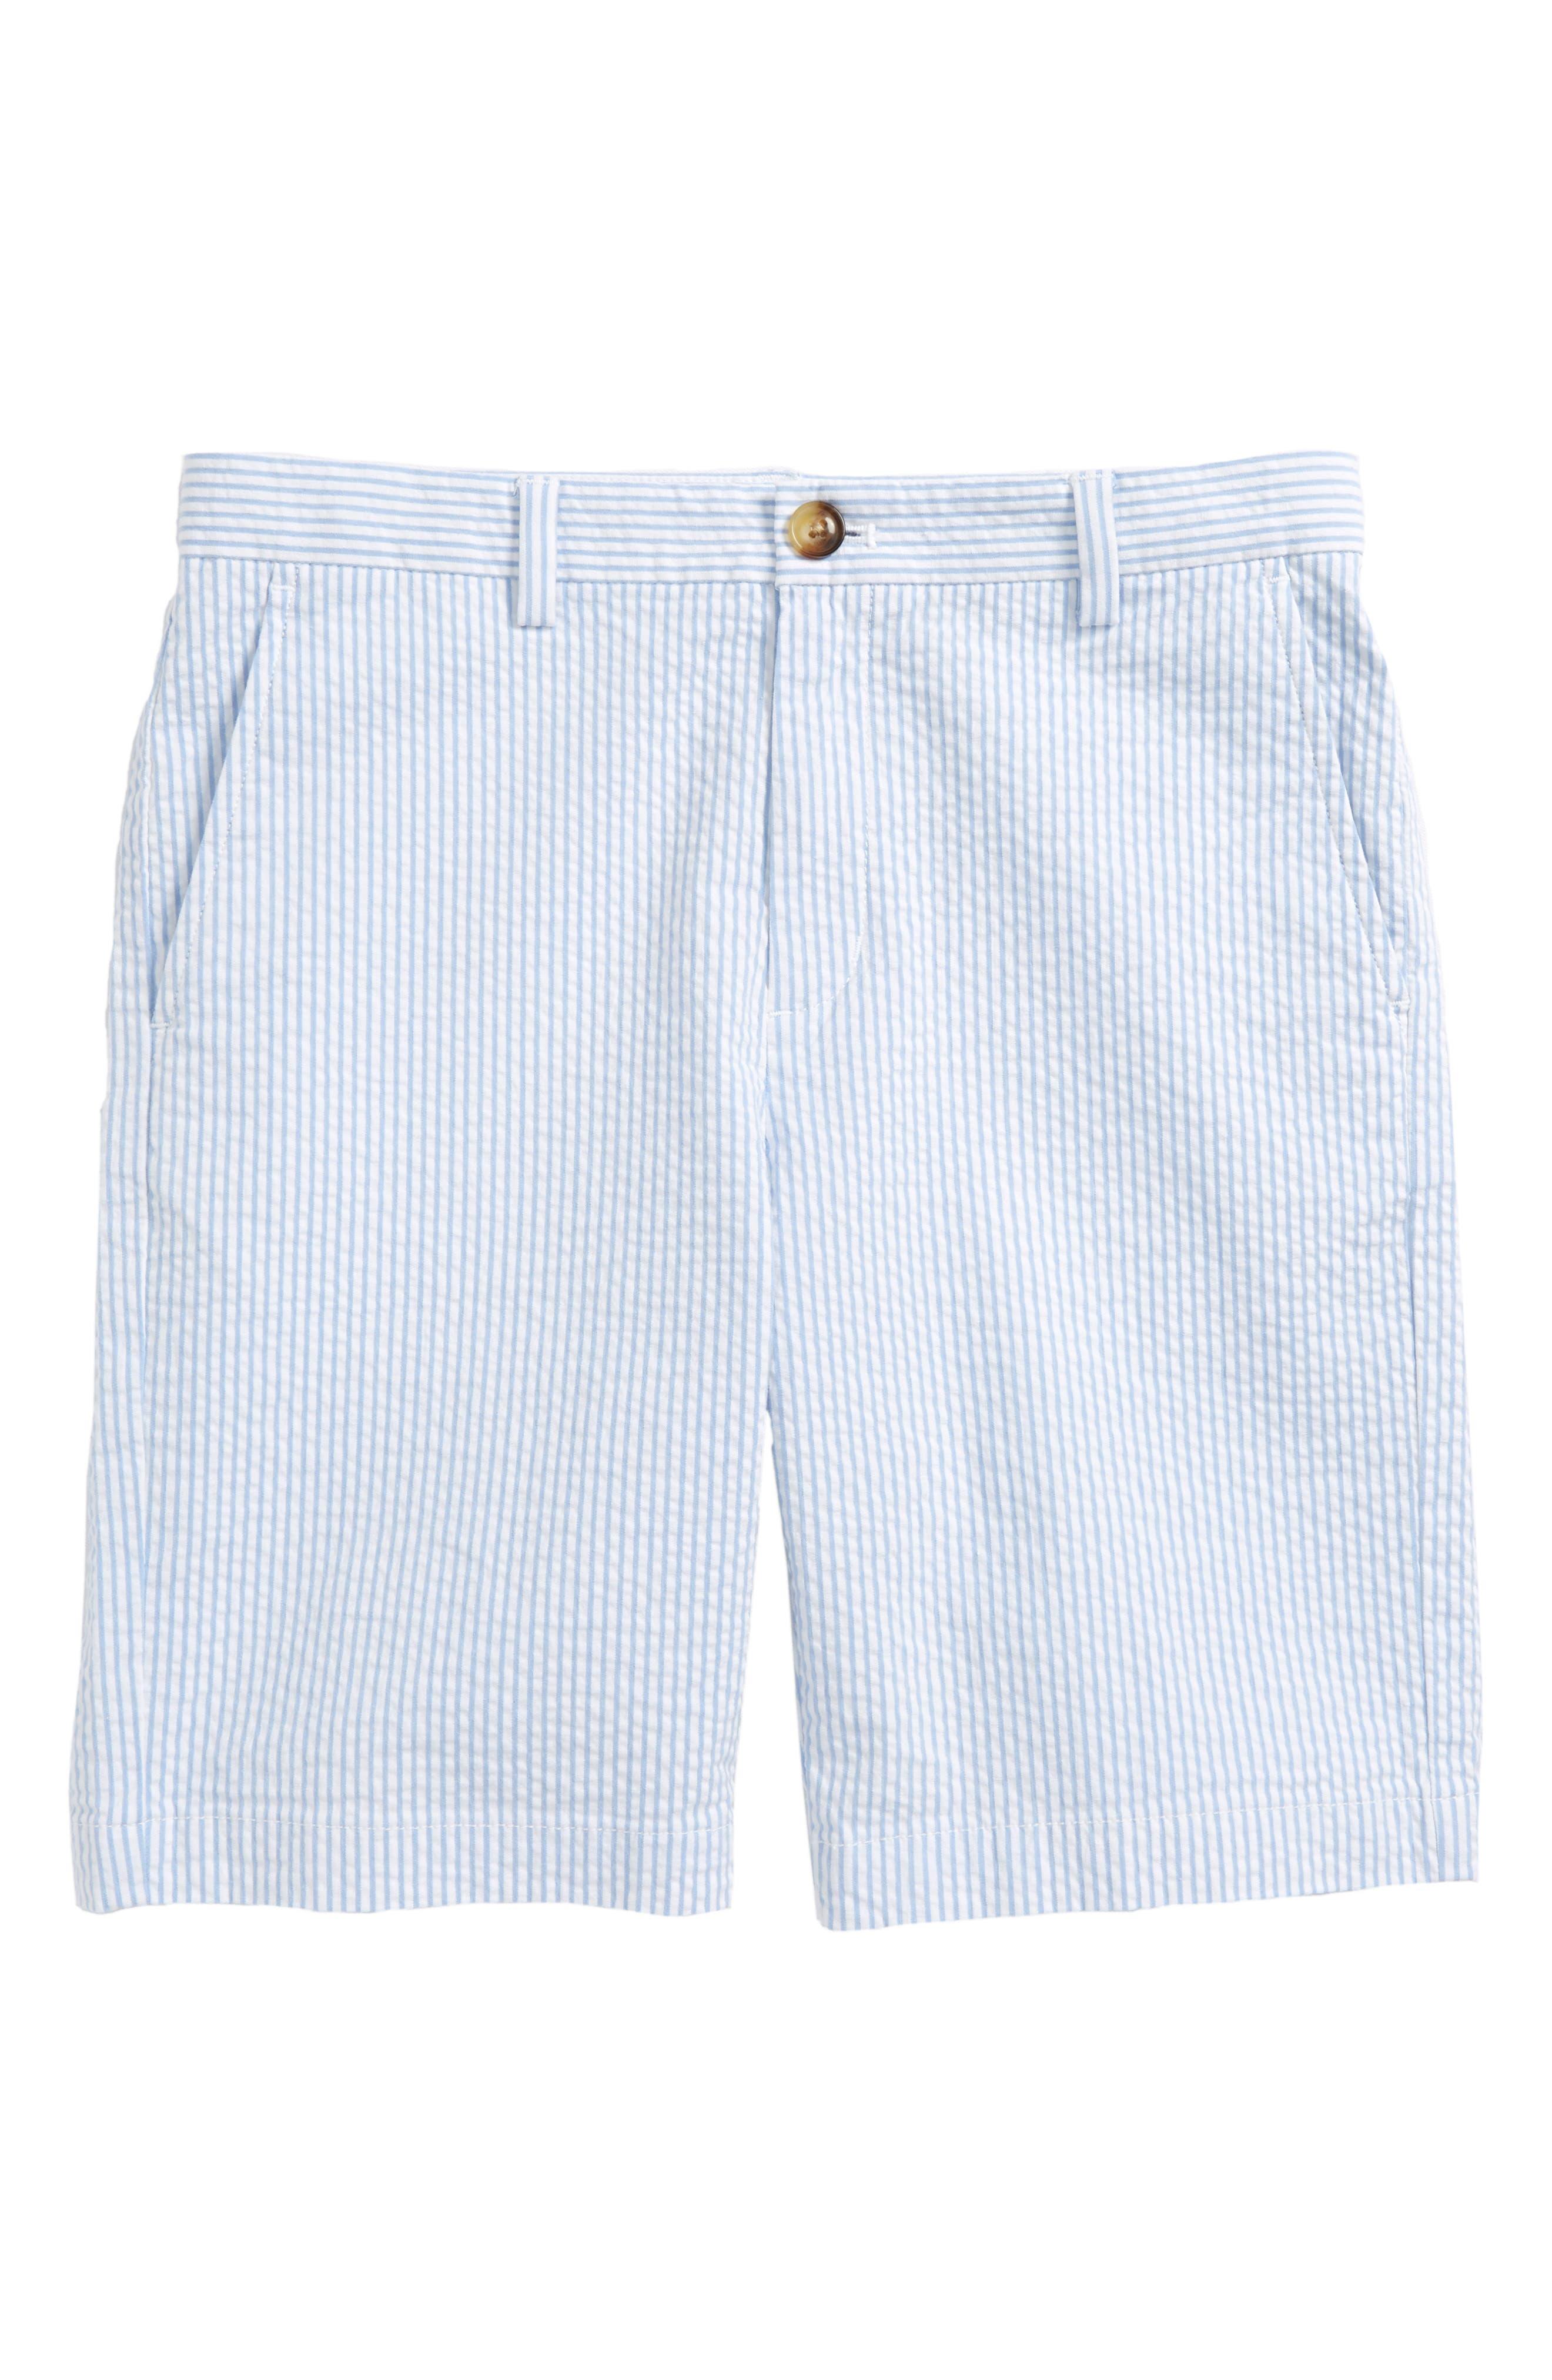 Seersucker Stripe Breaker Shorts,                             Main thumbnail 1, color,                             Ocean Breeze